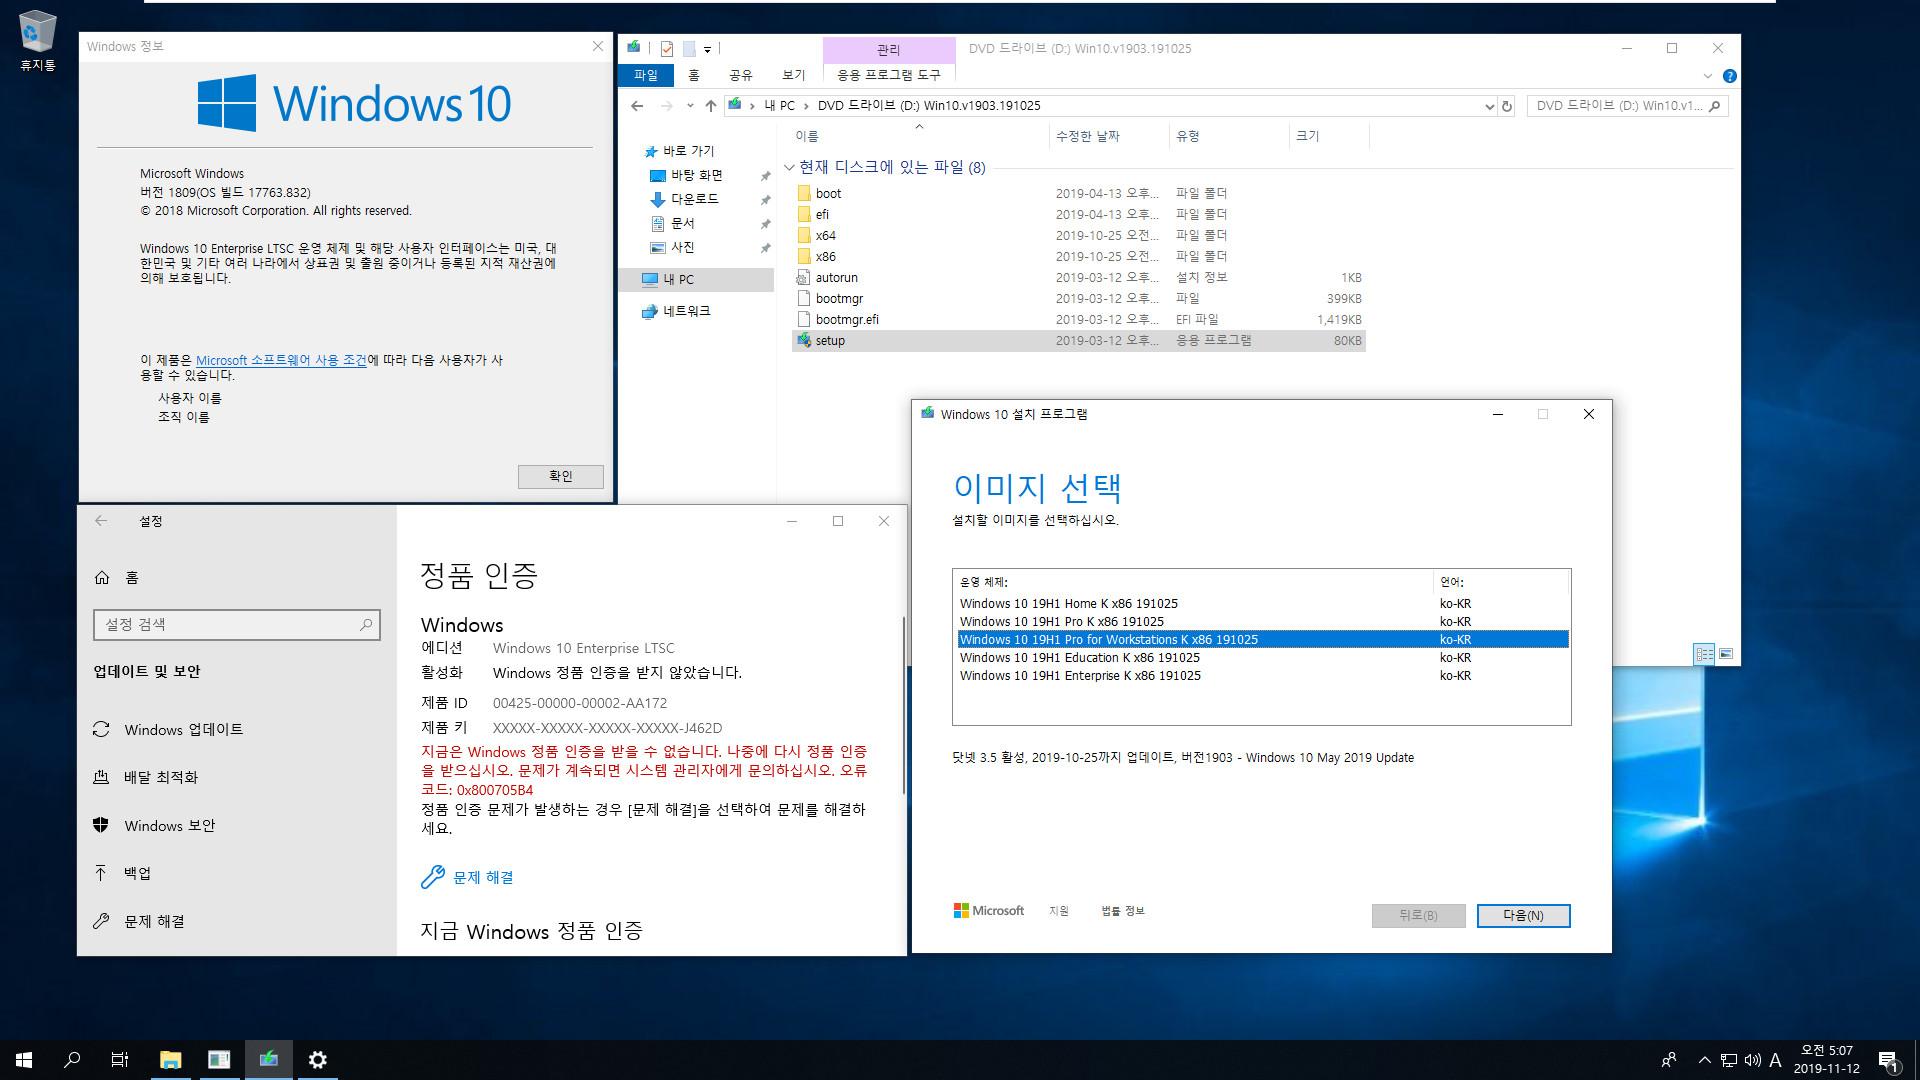 Windows 10 Enterprise LTSC [2019] (버전 1809) 를 버전 1903 프로로 업그레이드 설치하기 - 우선 설정과 앱 유지를 위해서 버전 1903 Enterprise로 업그레이드 한 후에 버전 1903 Pro로 변경하면 됩니다 2019-11-12_050735.jpg